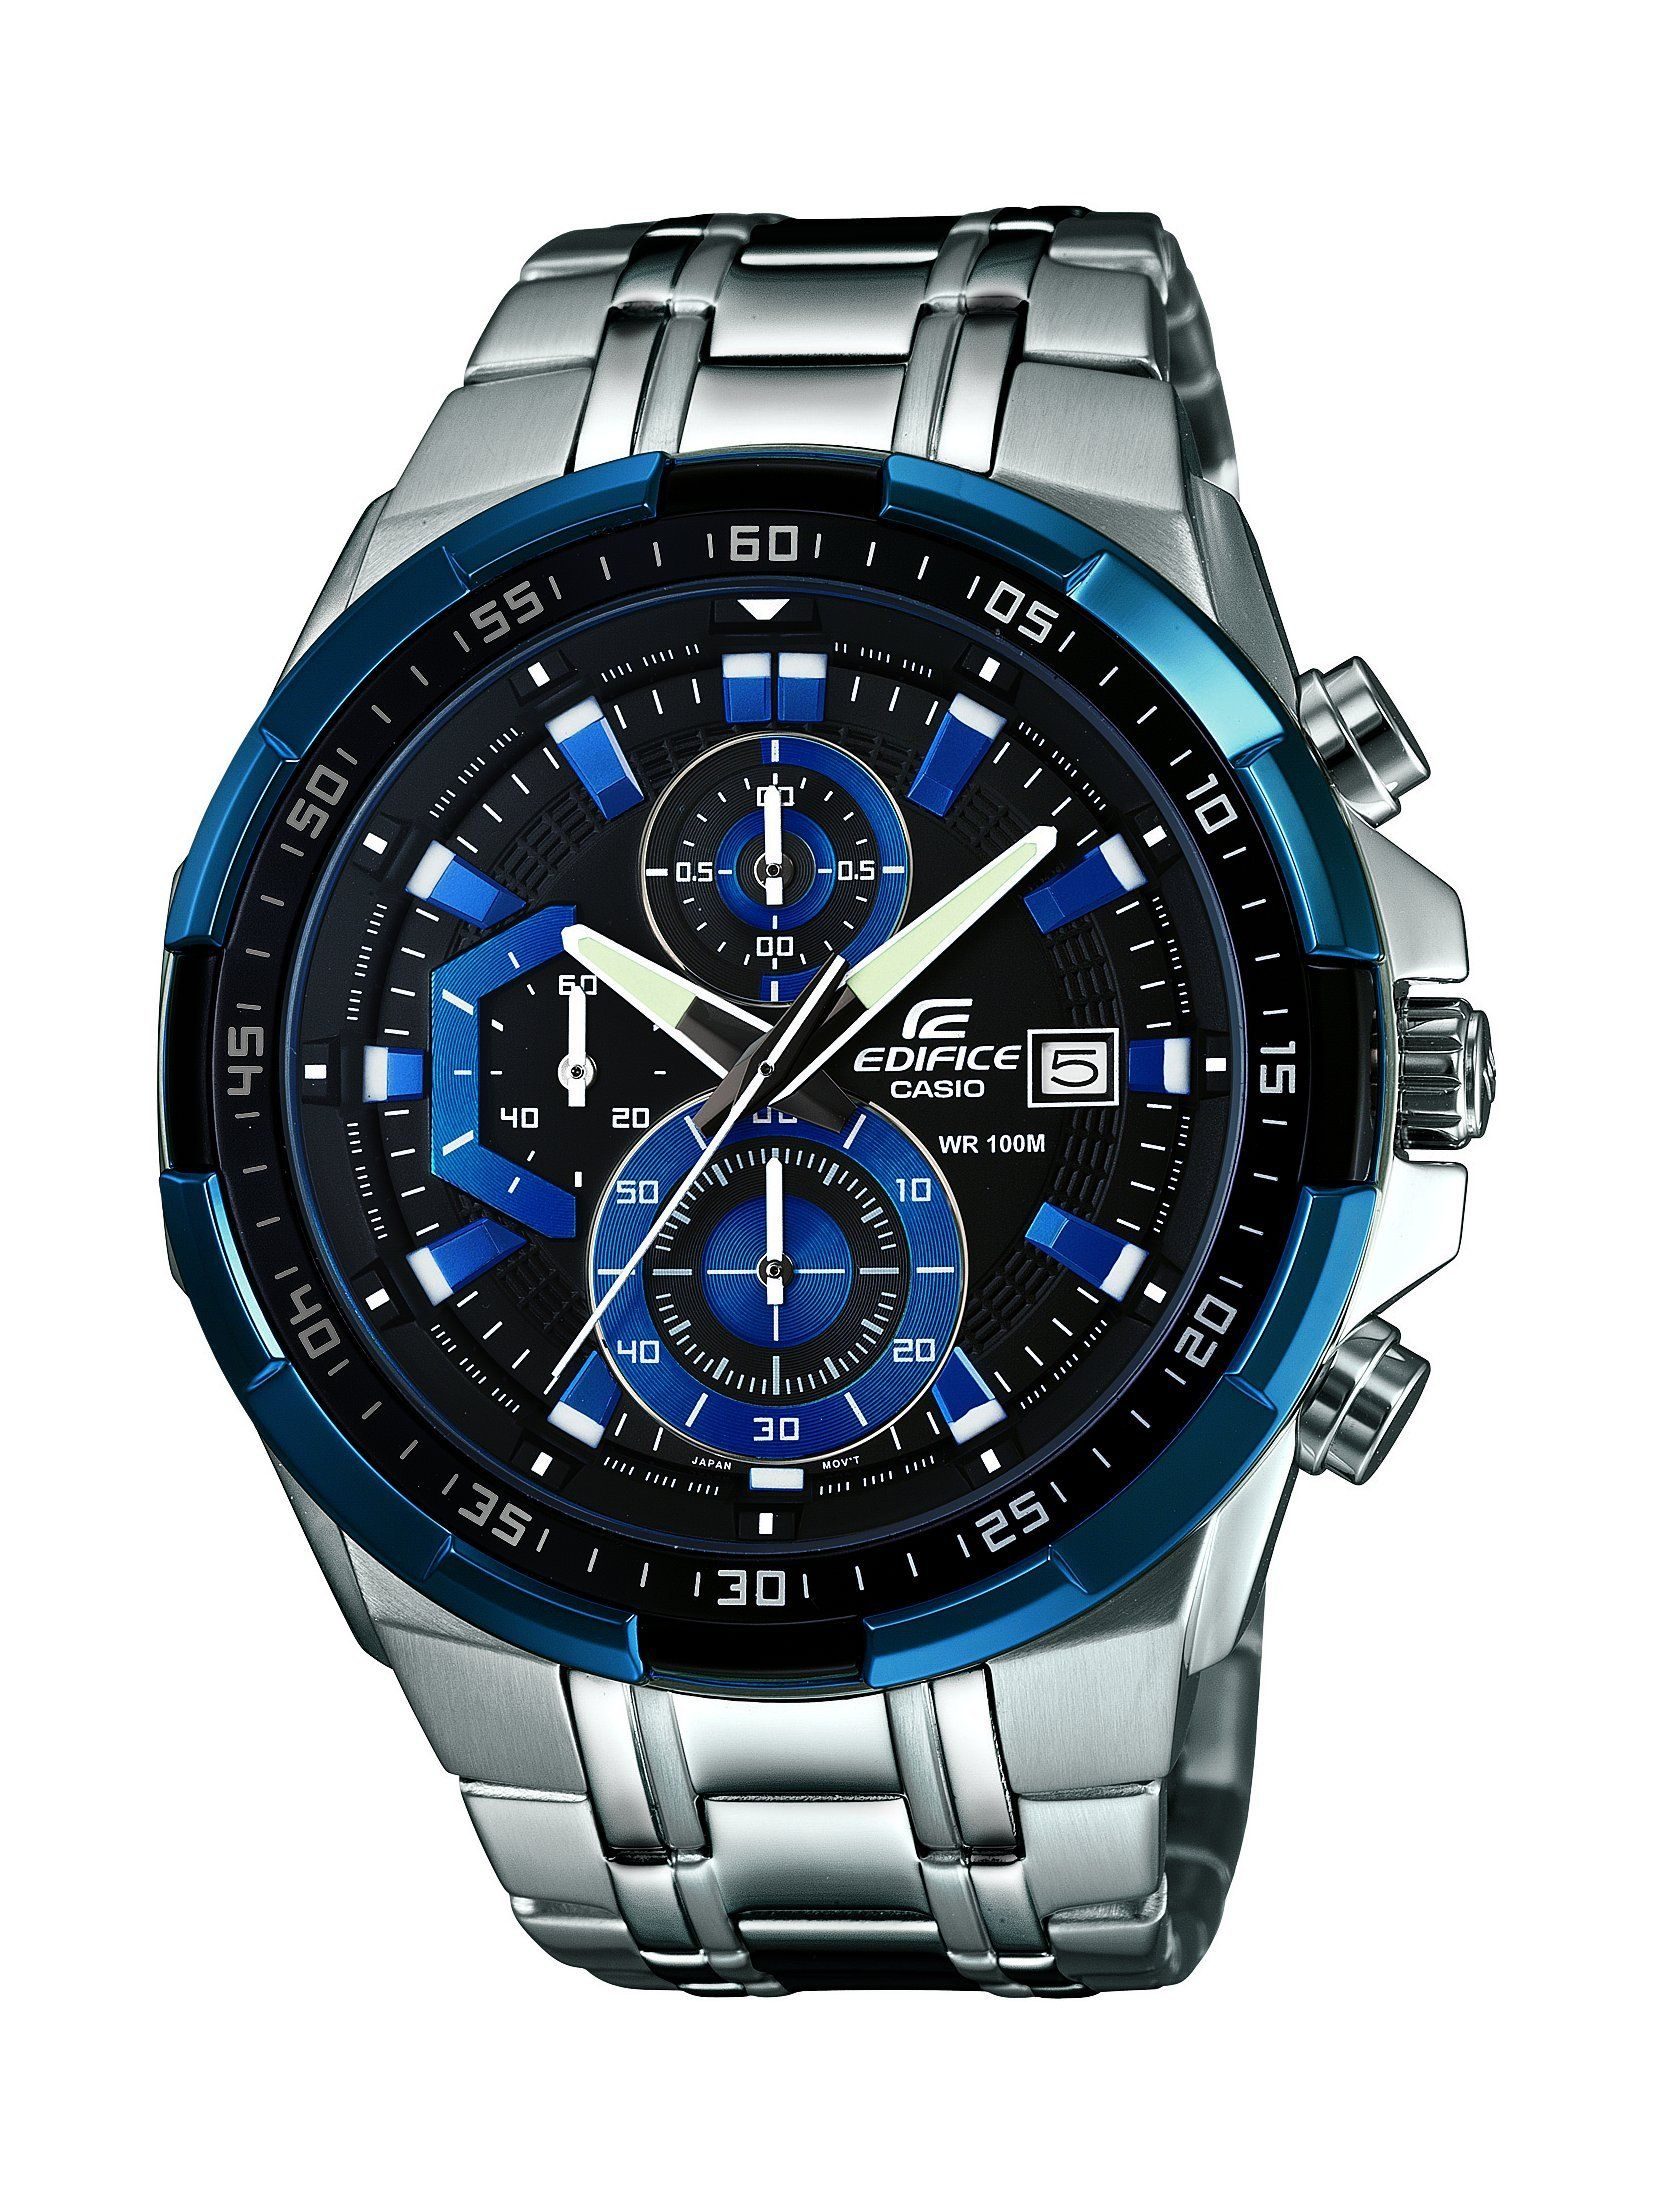 Casio Edifice EFR539D1A2VUEF Relógio casio, Relogios